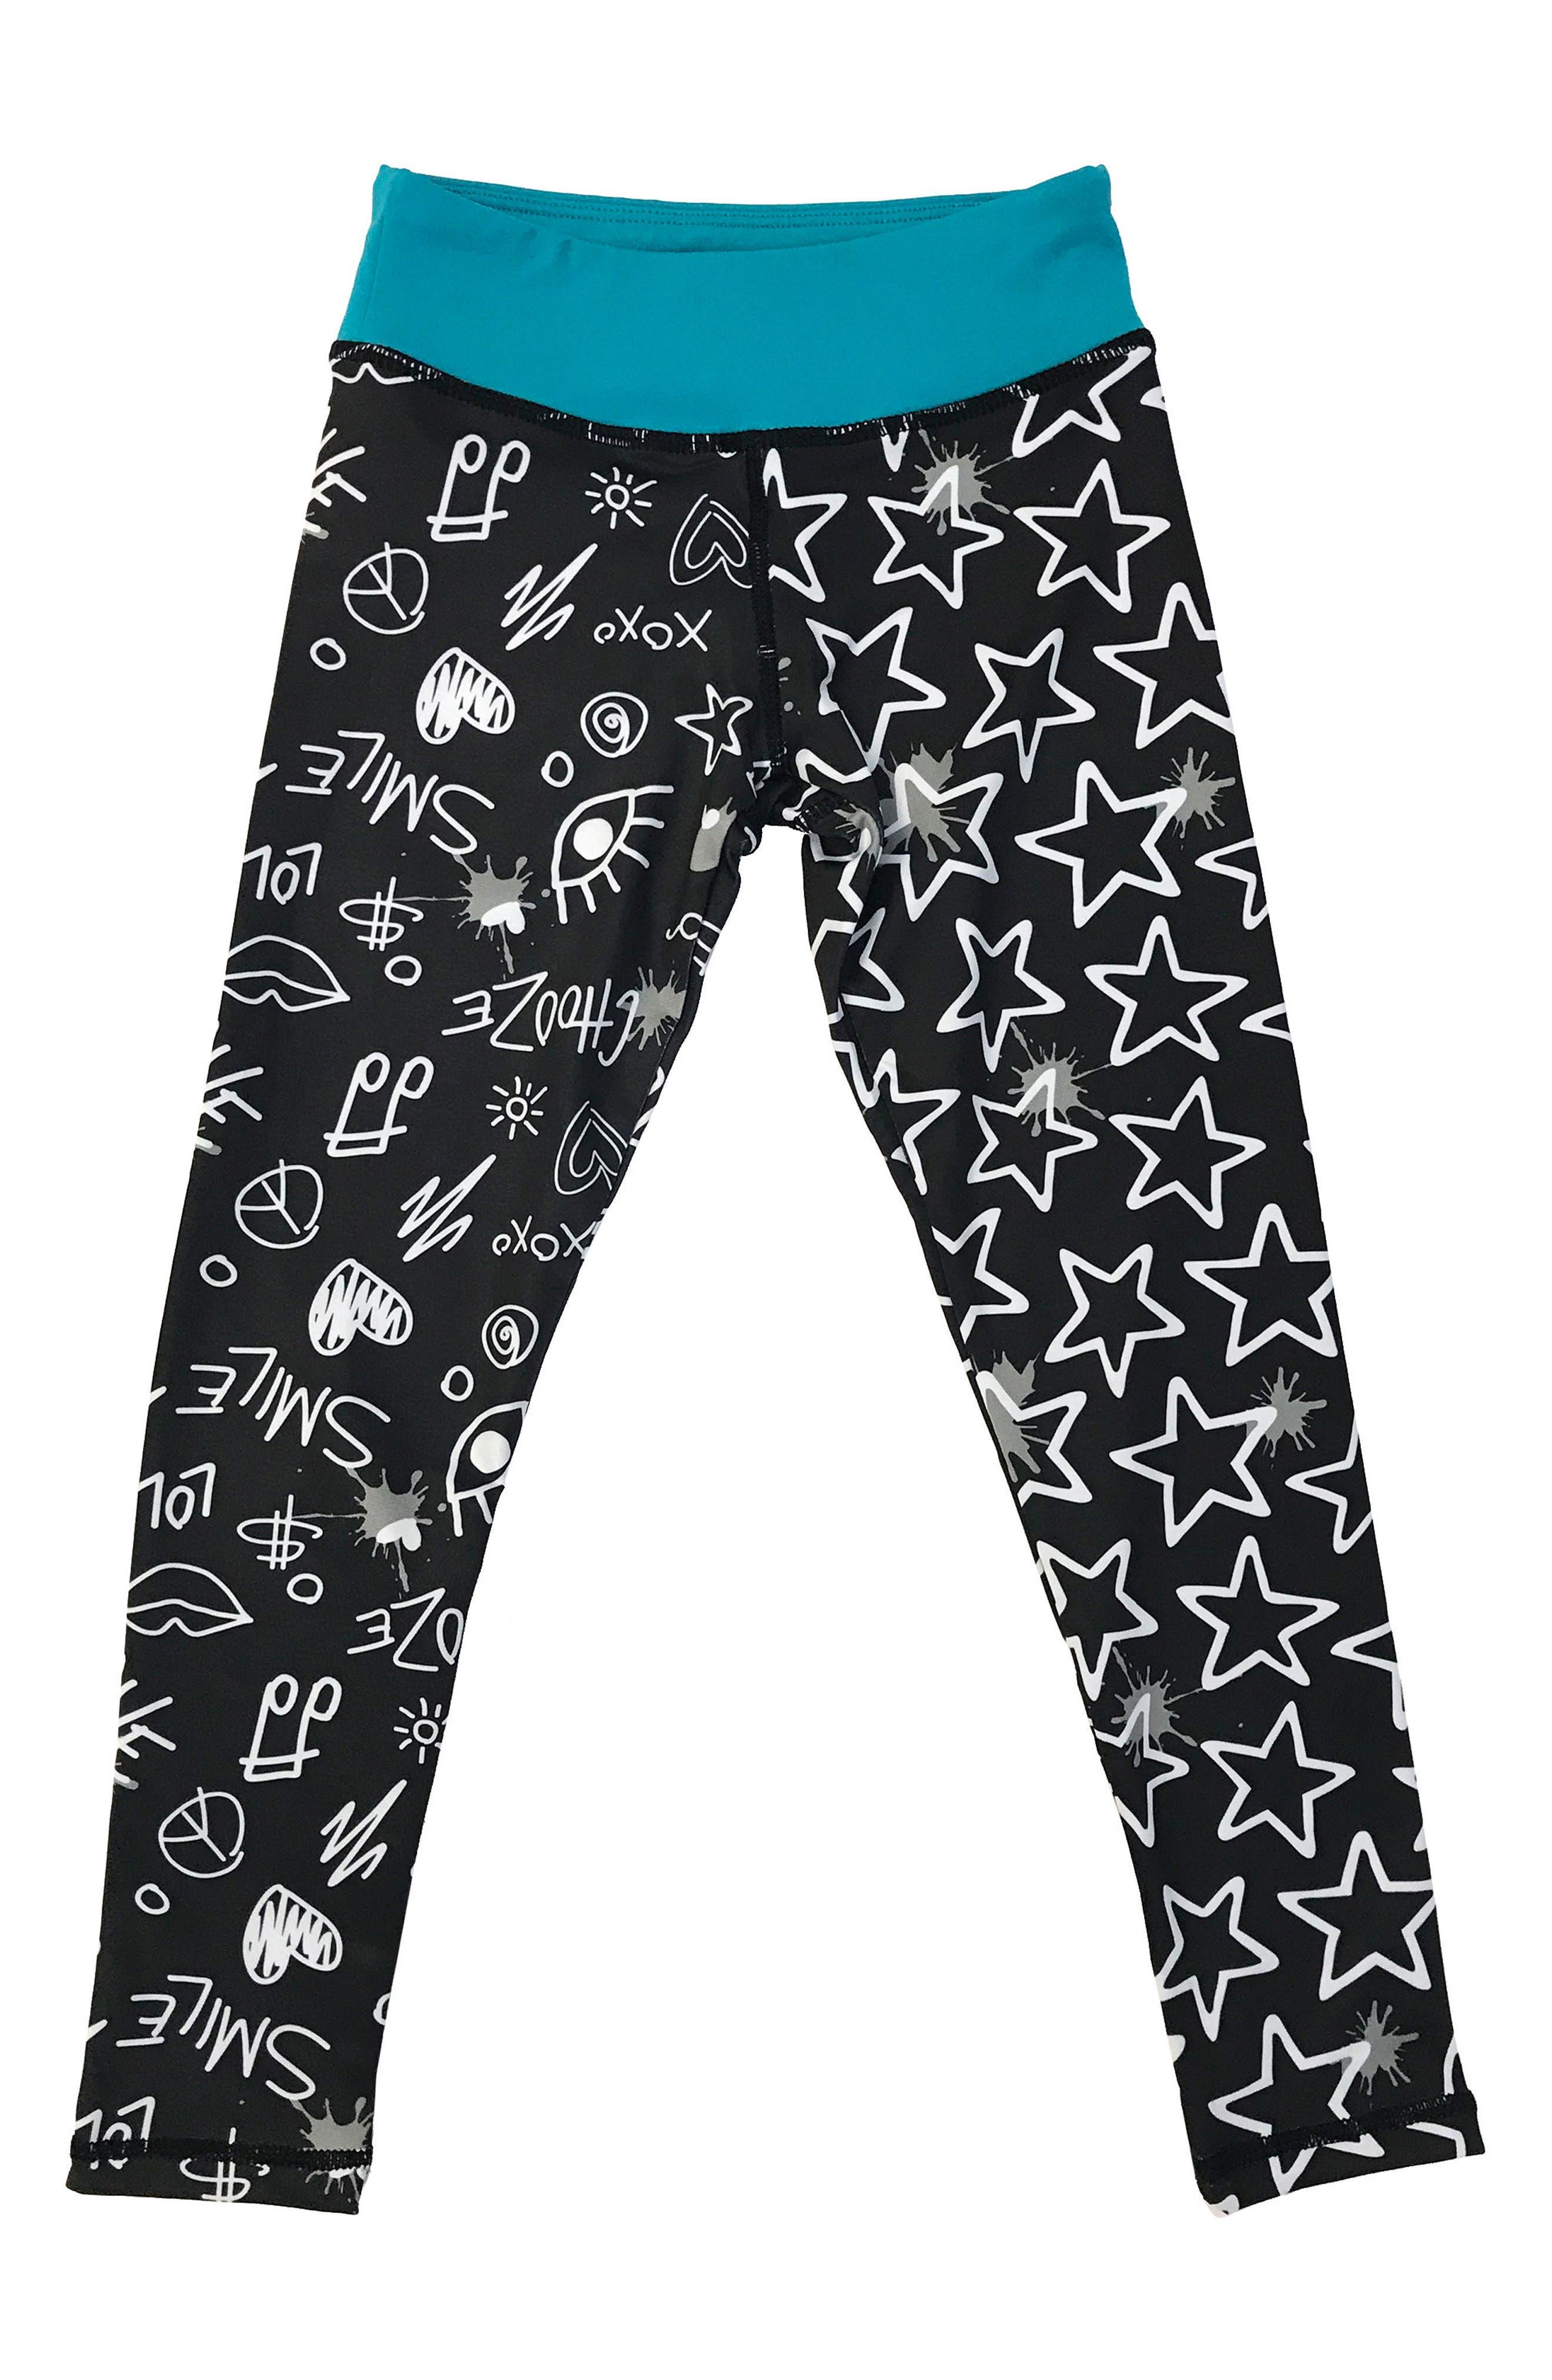 'Splits' Mixed Print Leggings,                             Alternate thumbnail 3, color,                             Draw Black